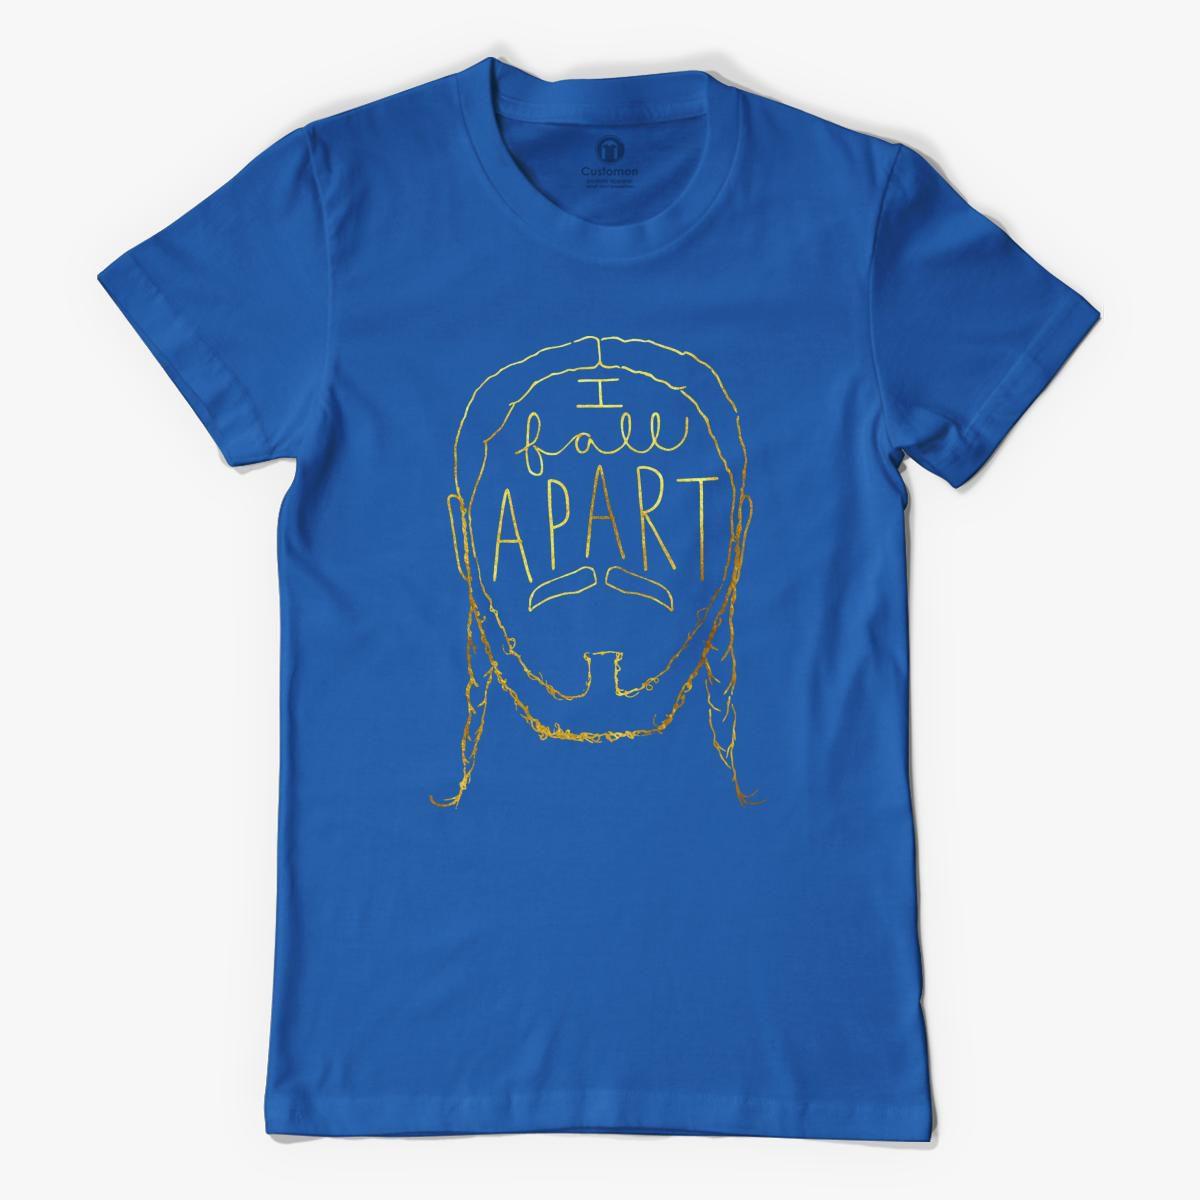 Post Malone I Fall Apart Guitar: Post Malone I Fall Apart Women's T-shirt